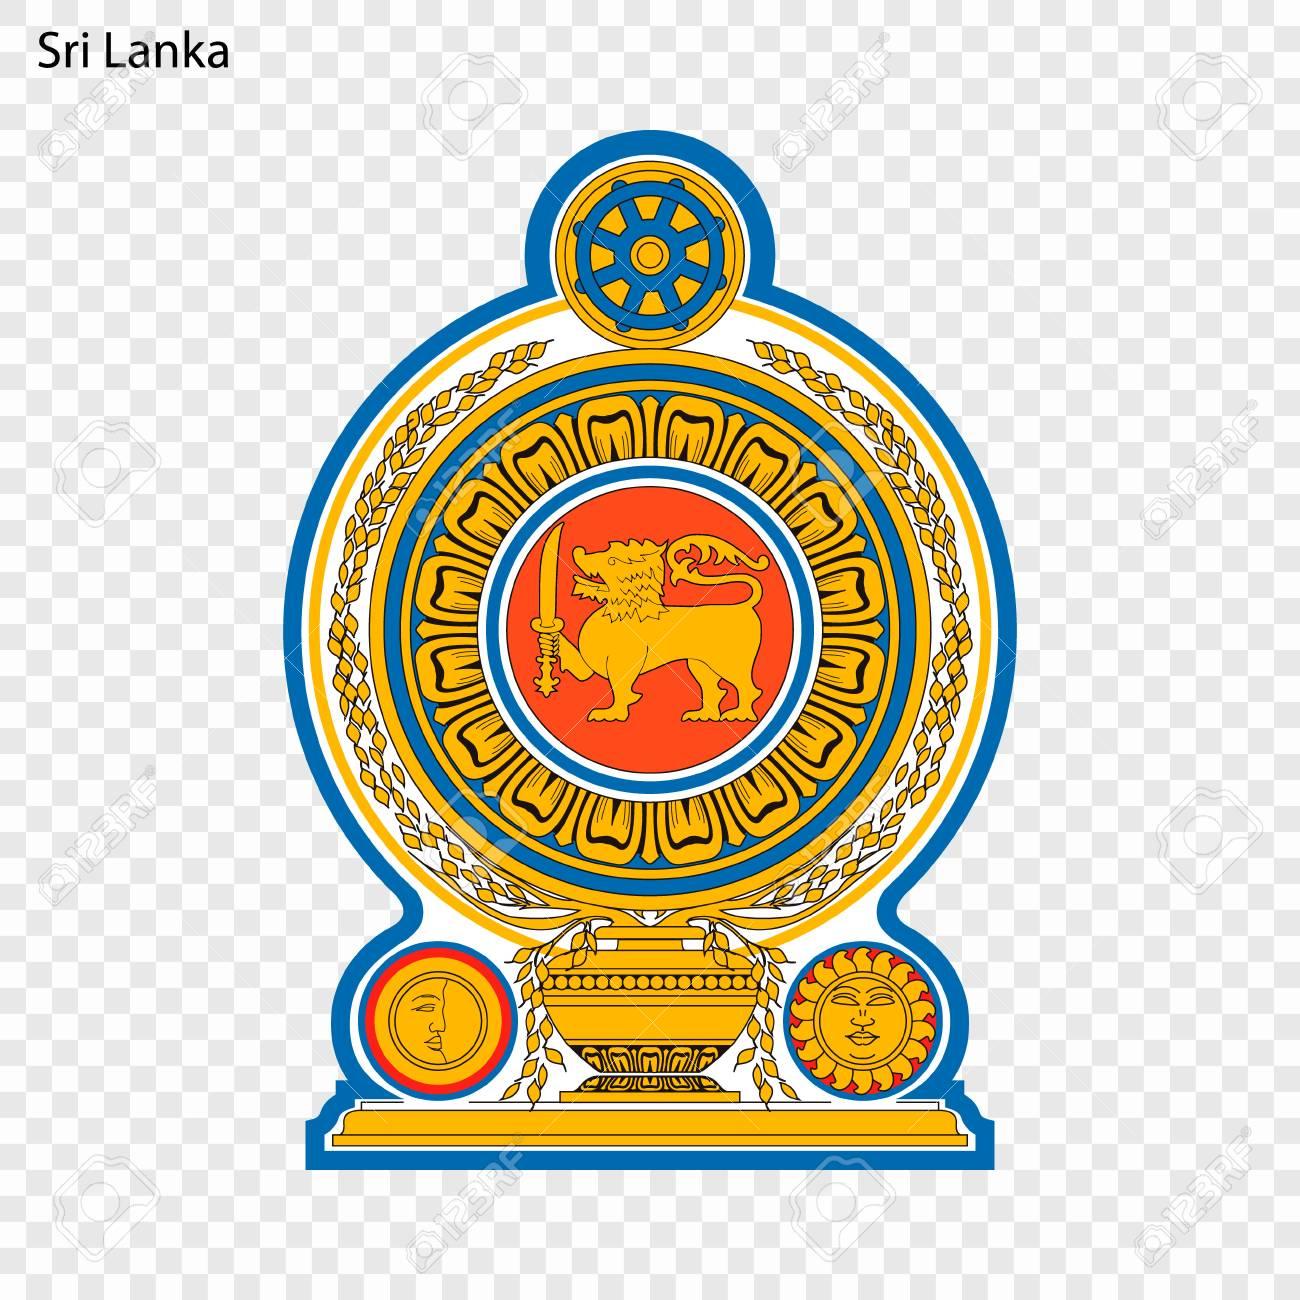 Symbol of Sri Lanka  National emblem